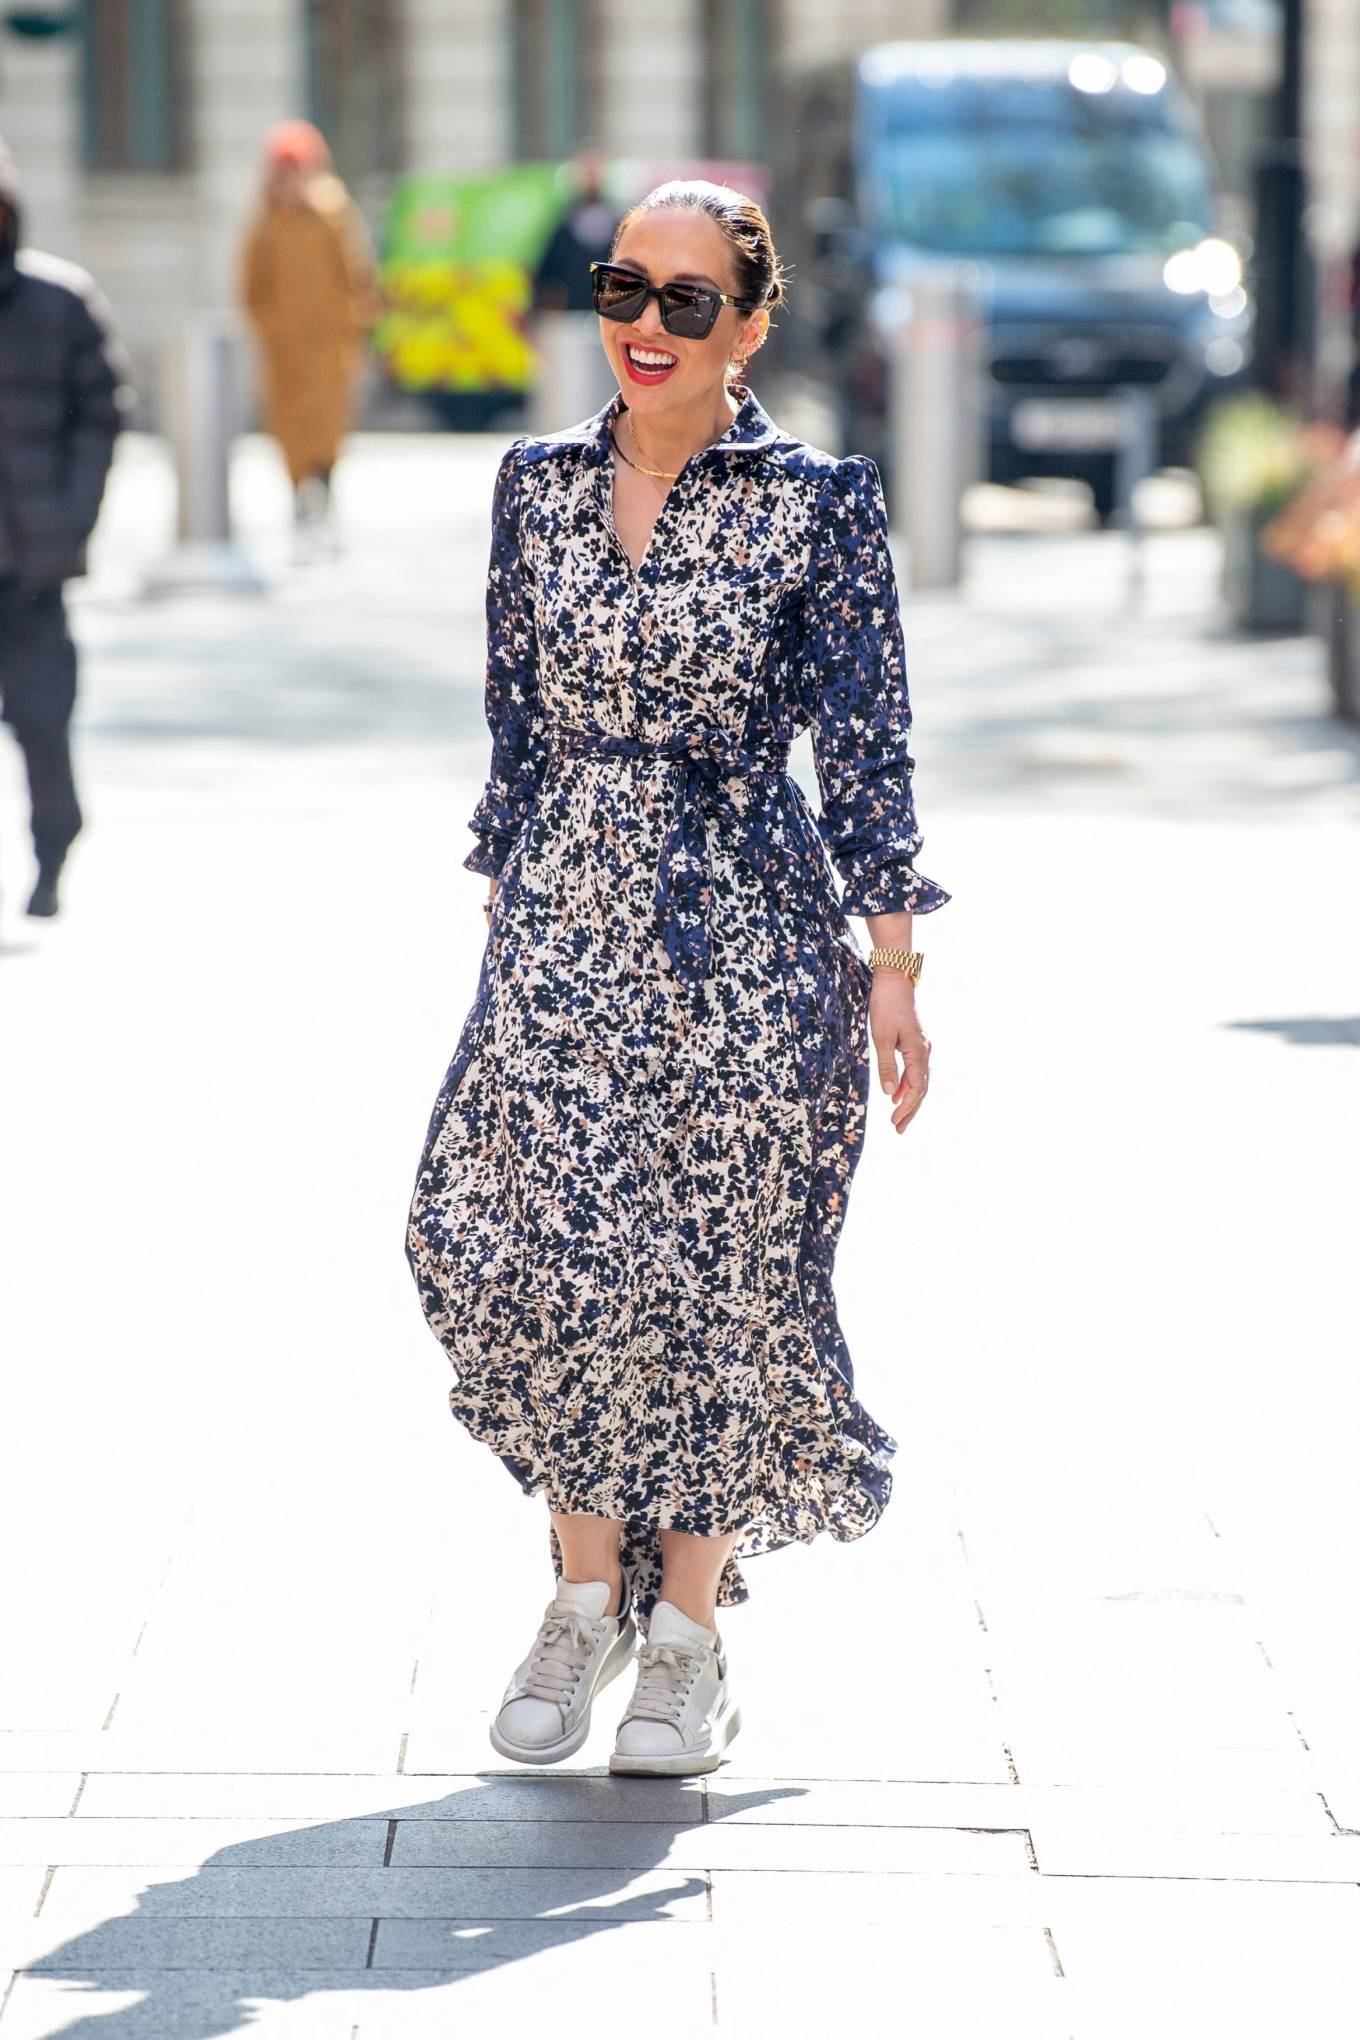 Myleene Klass 2021 : Myleene Klass – In a long summer dress arriving at the Global studios -12